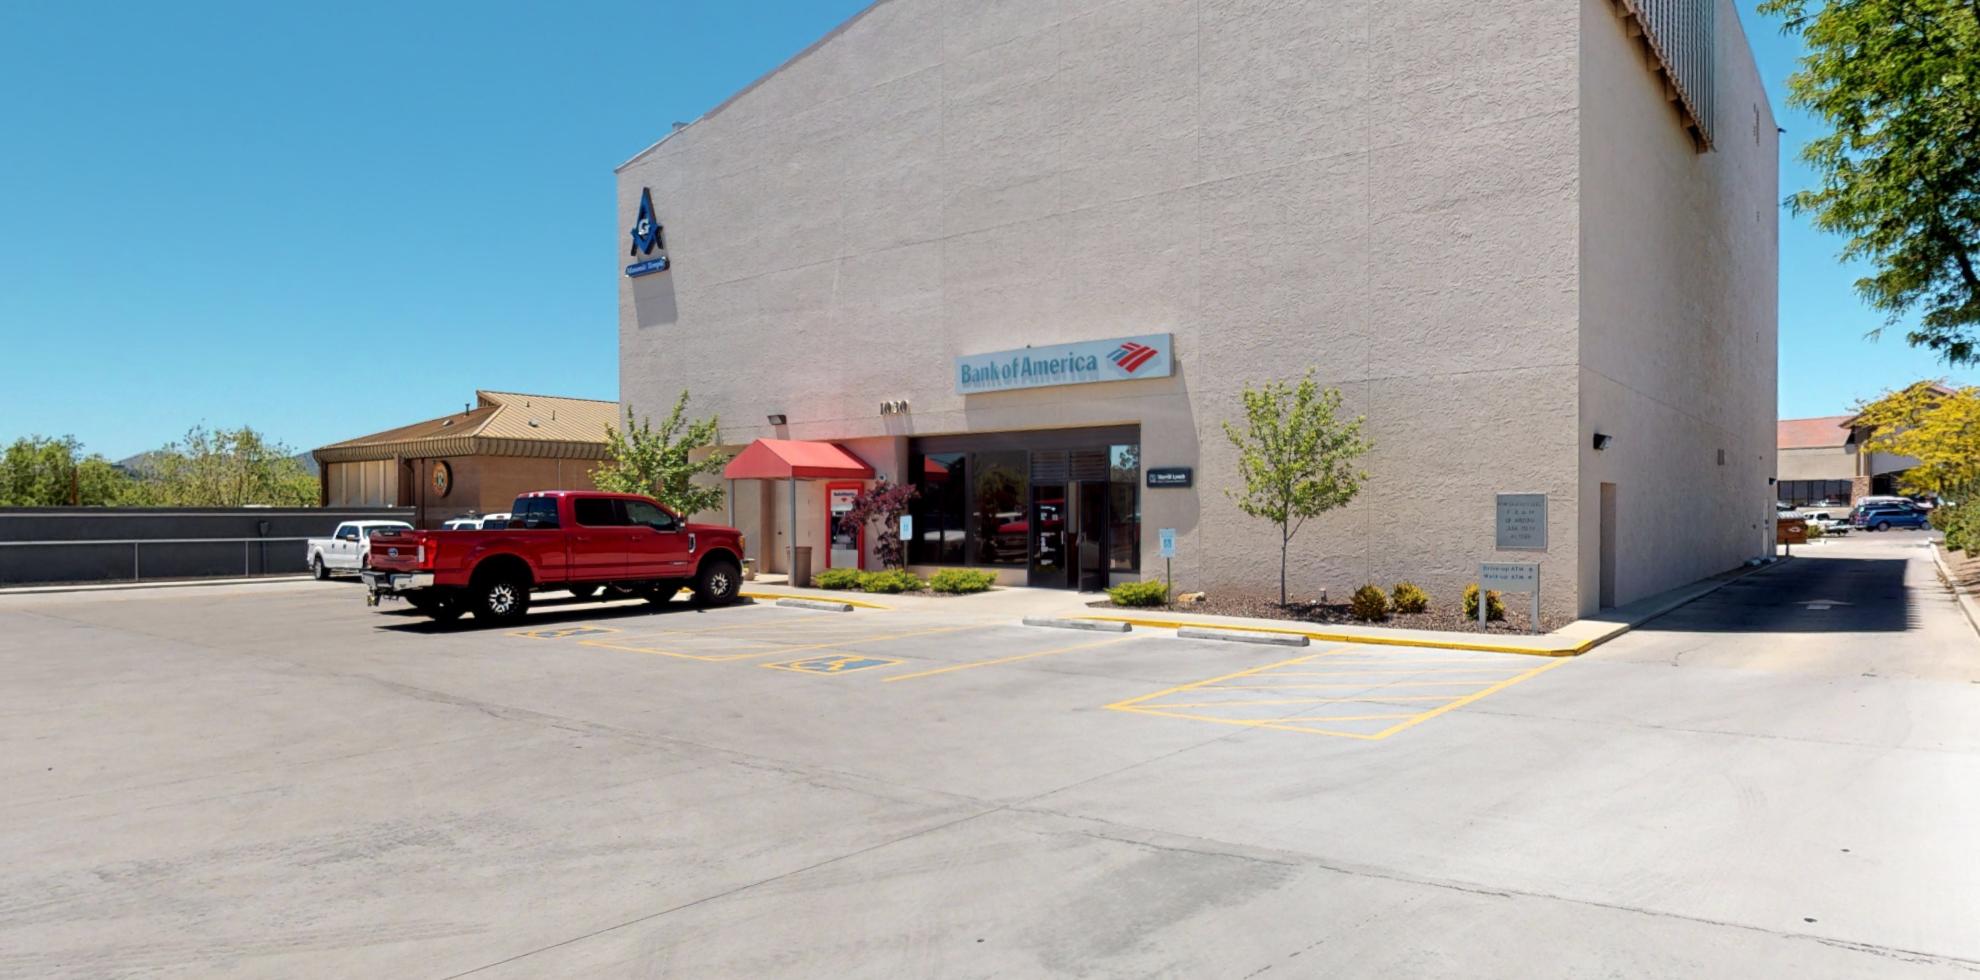 Bank of America financial center with drive-thru ATM | 1030 Willow Creek Rd, Prescott, AZ 86301